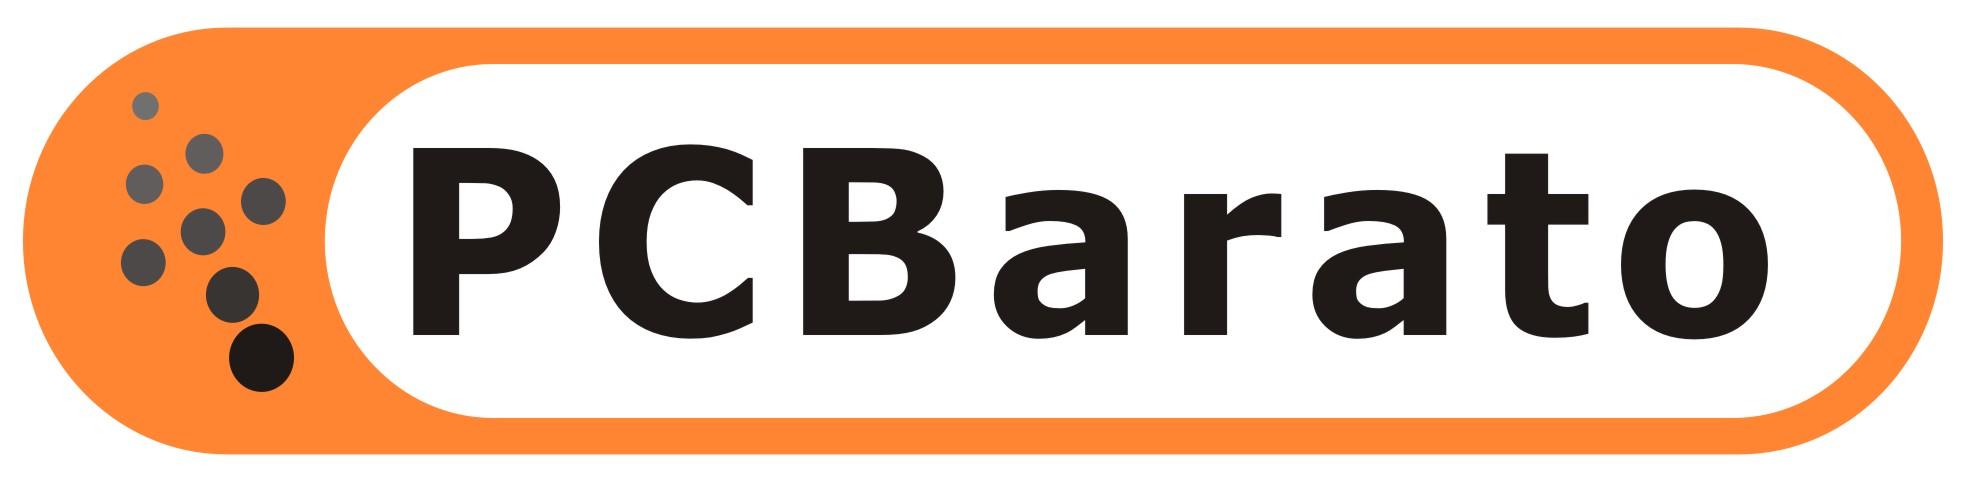 Logo Pcbarato